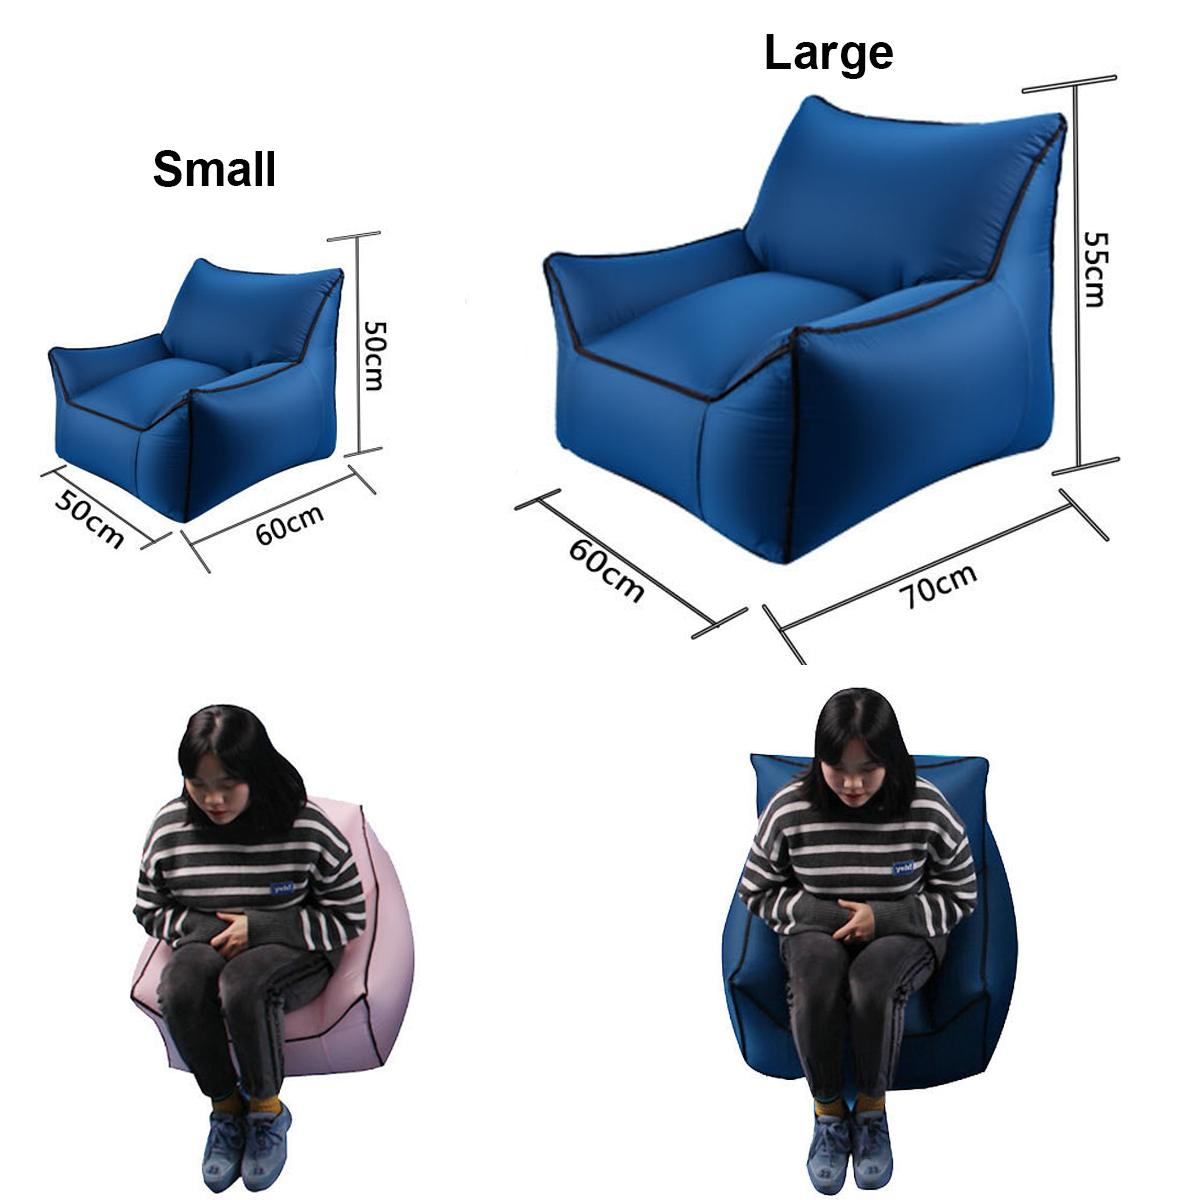 Opblaasbare Lounge Stoel.Opblaasbare Lounge Stoel Classy Living Nl